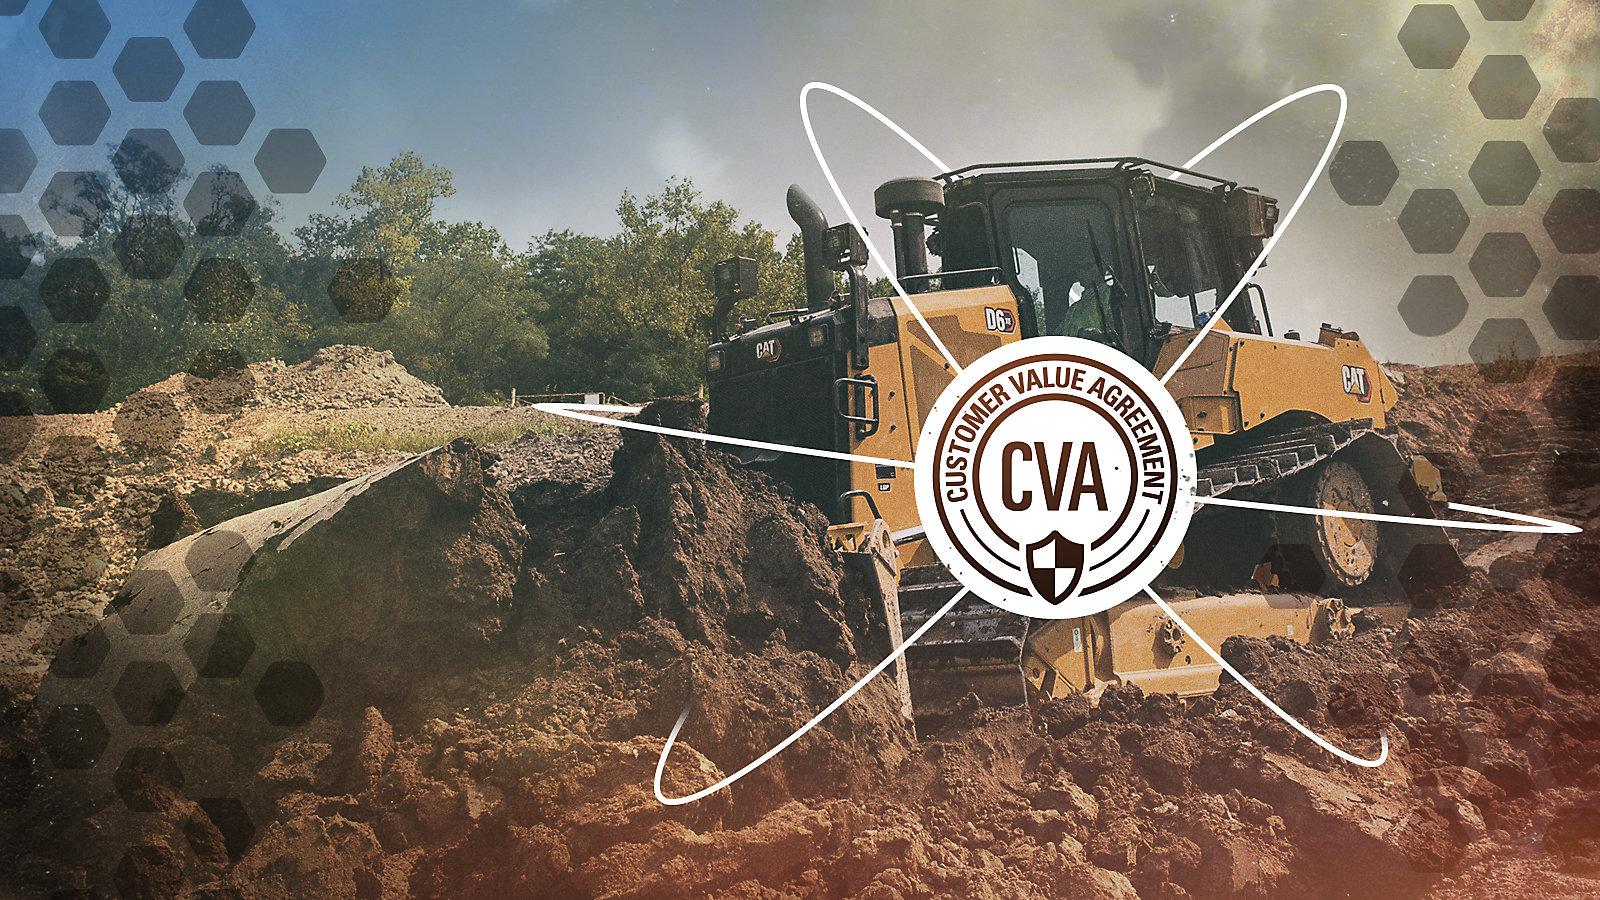 Cat Customer Value Agreements (CVAs)